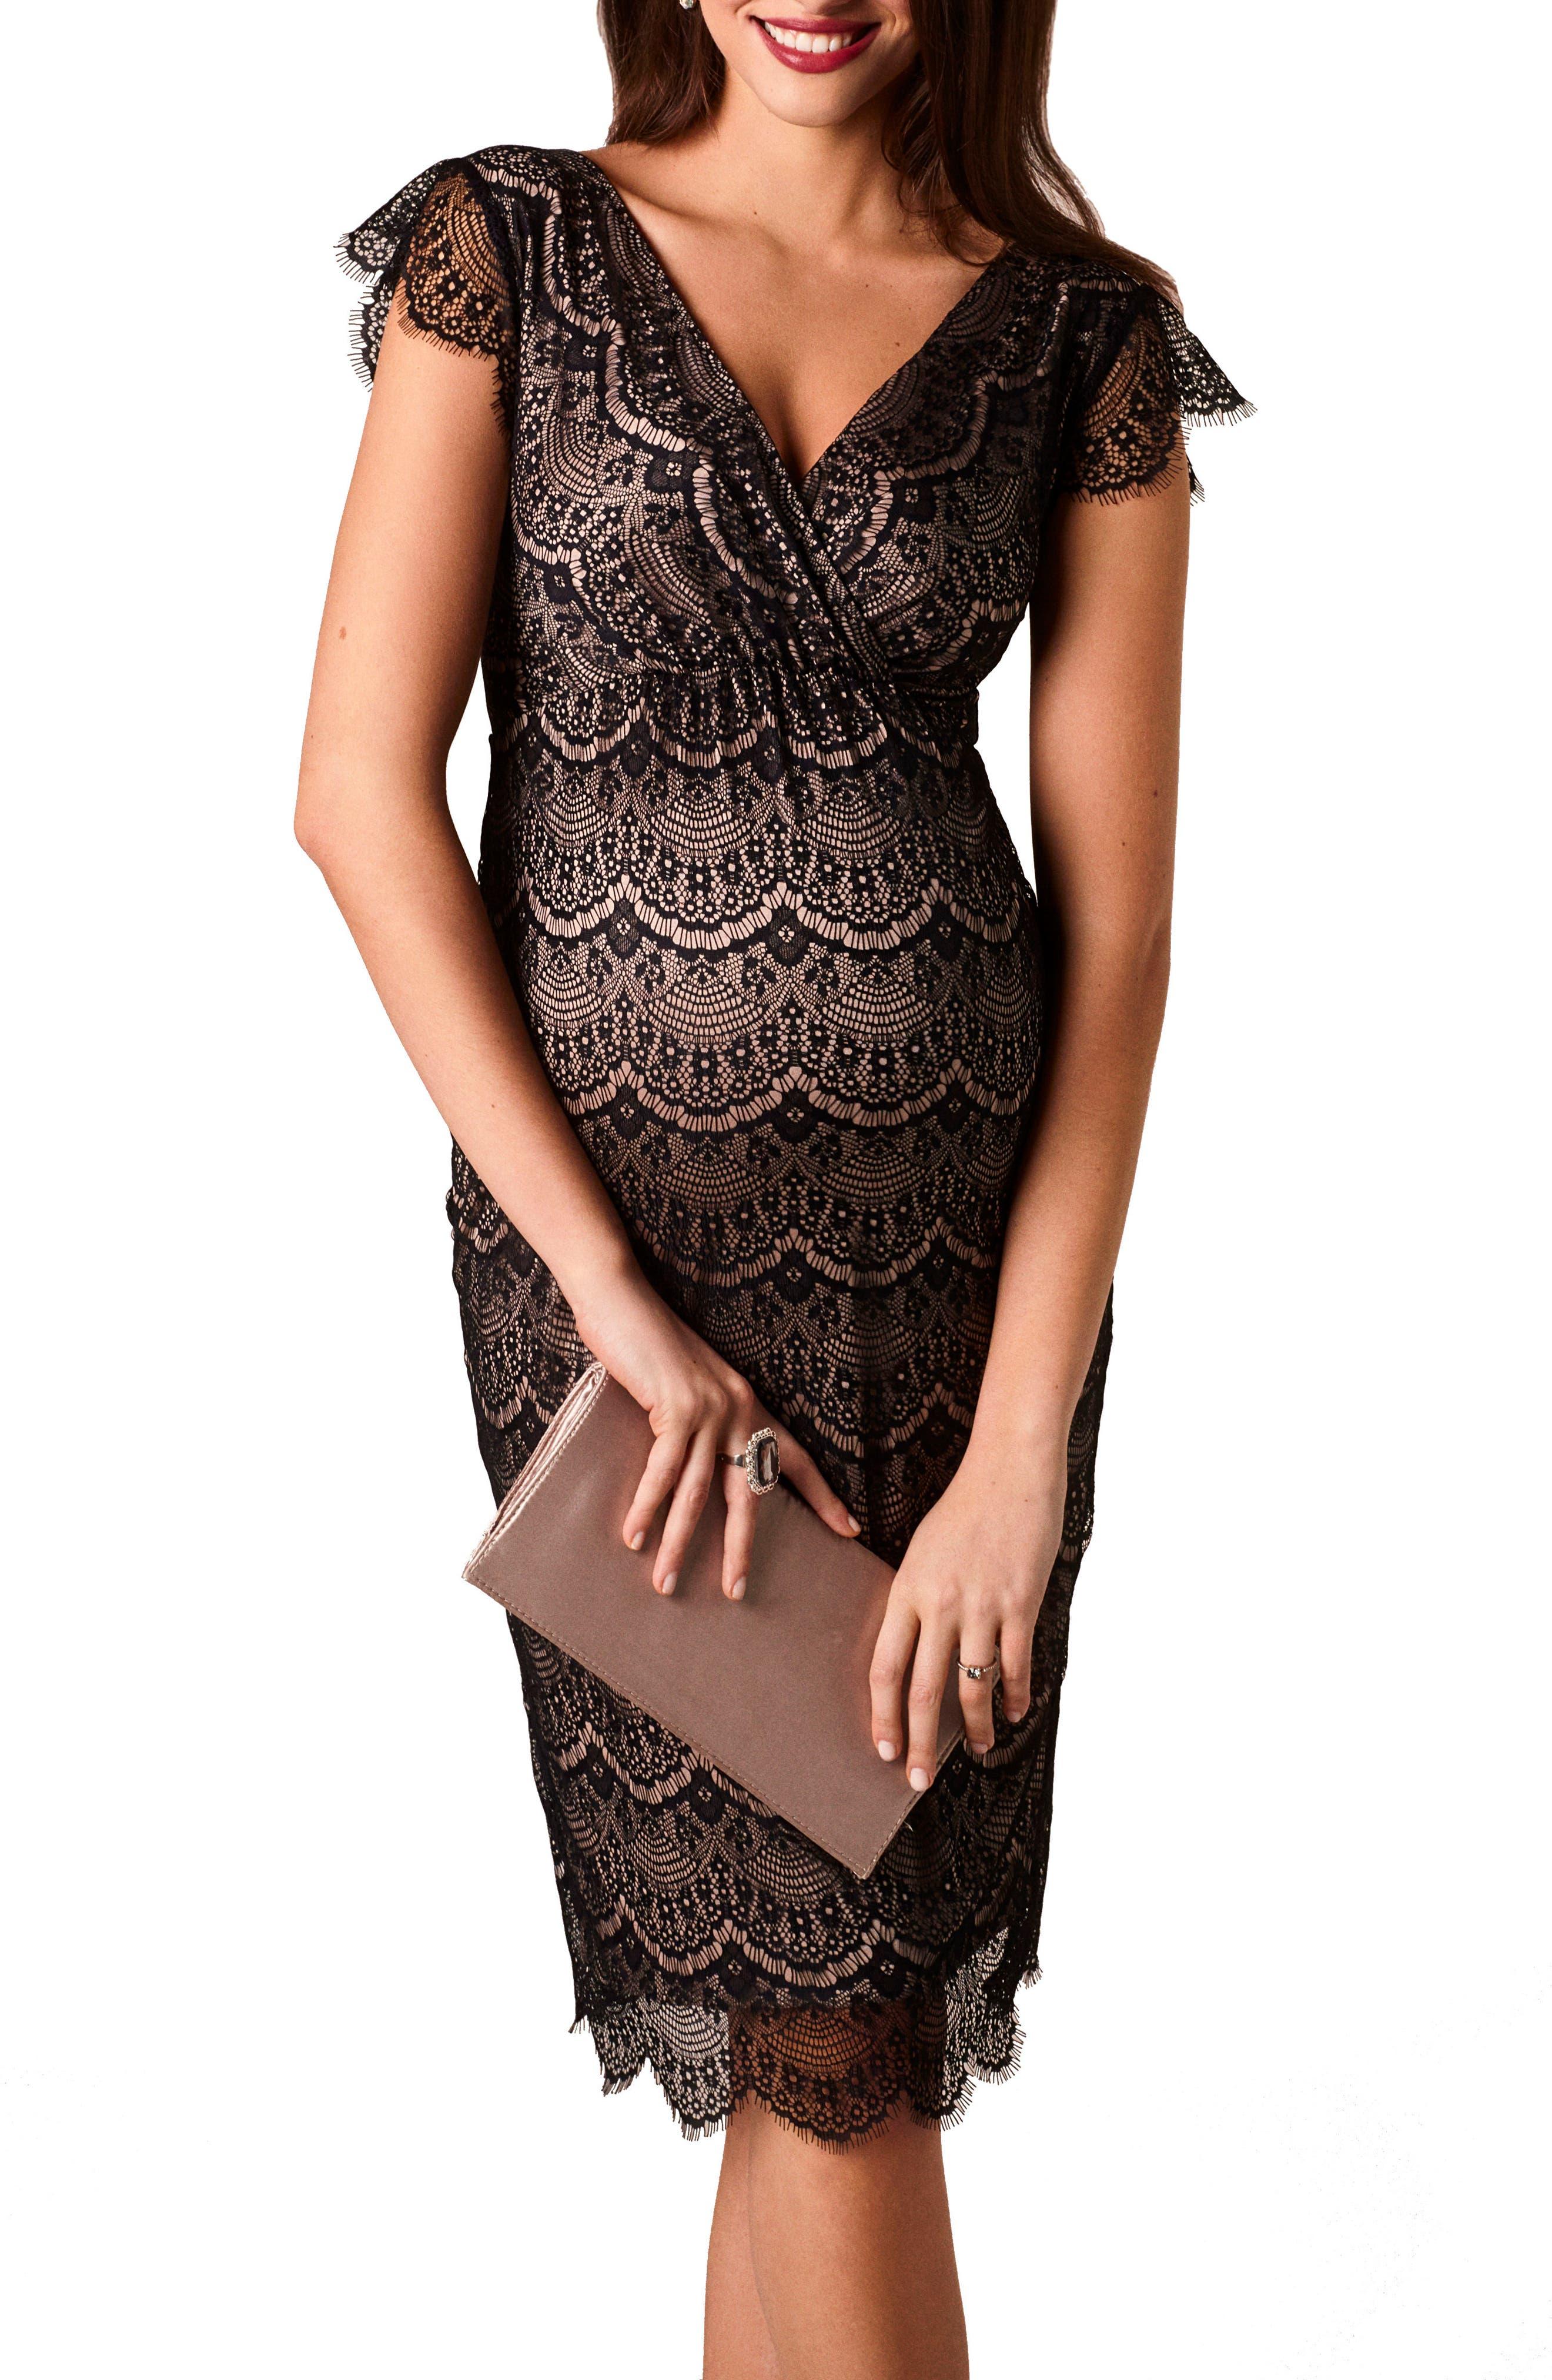 Tiffany Rose Imogen Maternity Dress